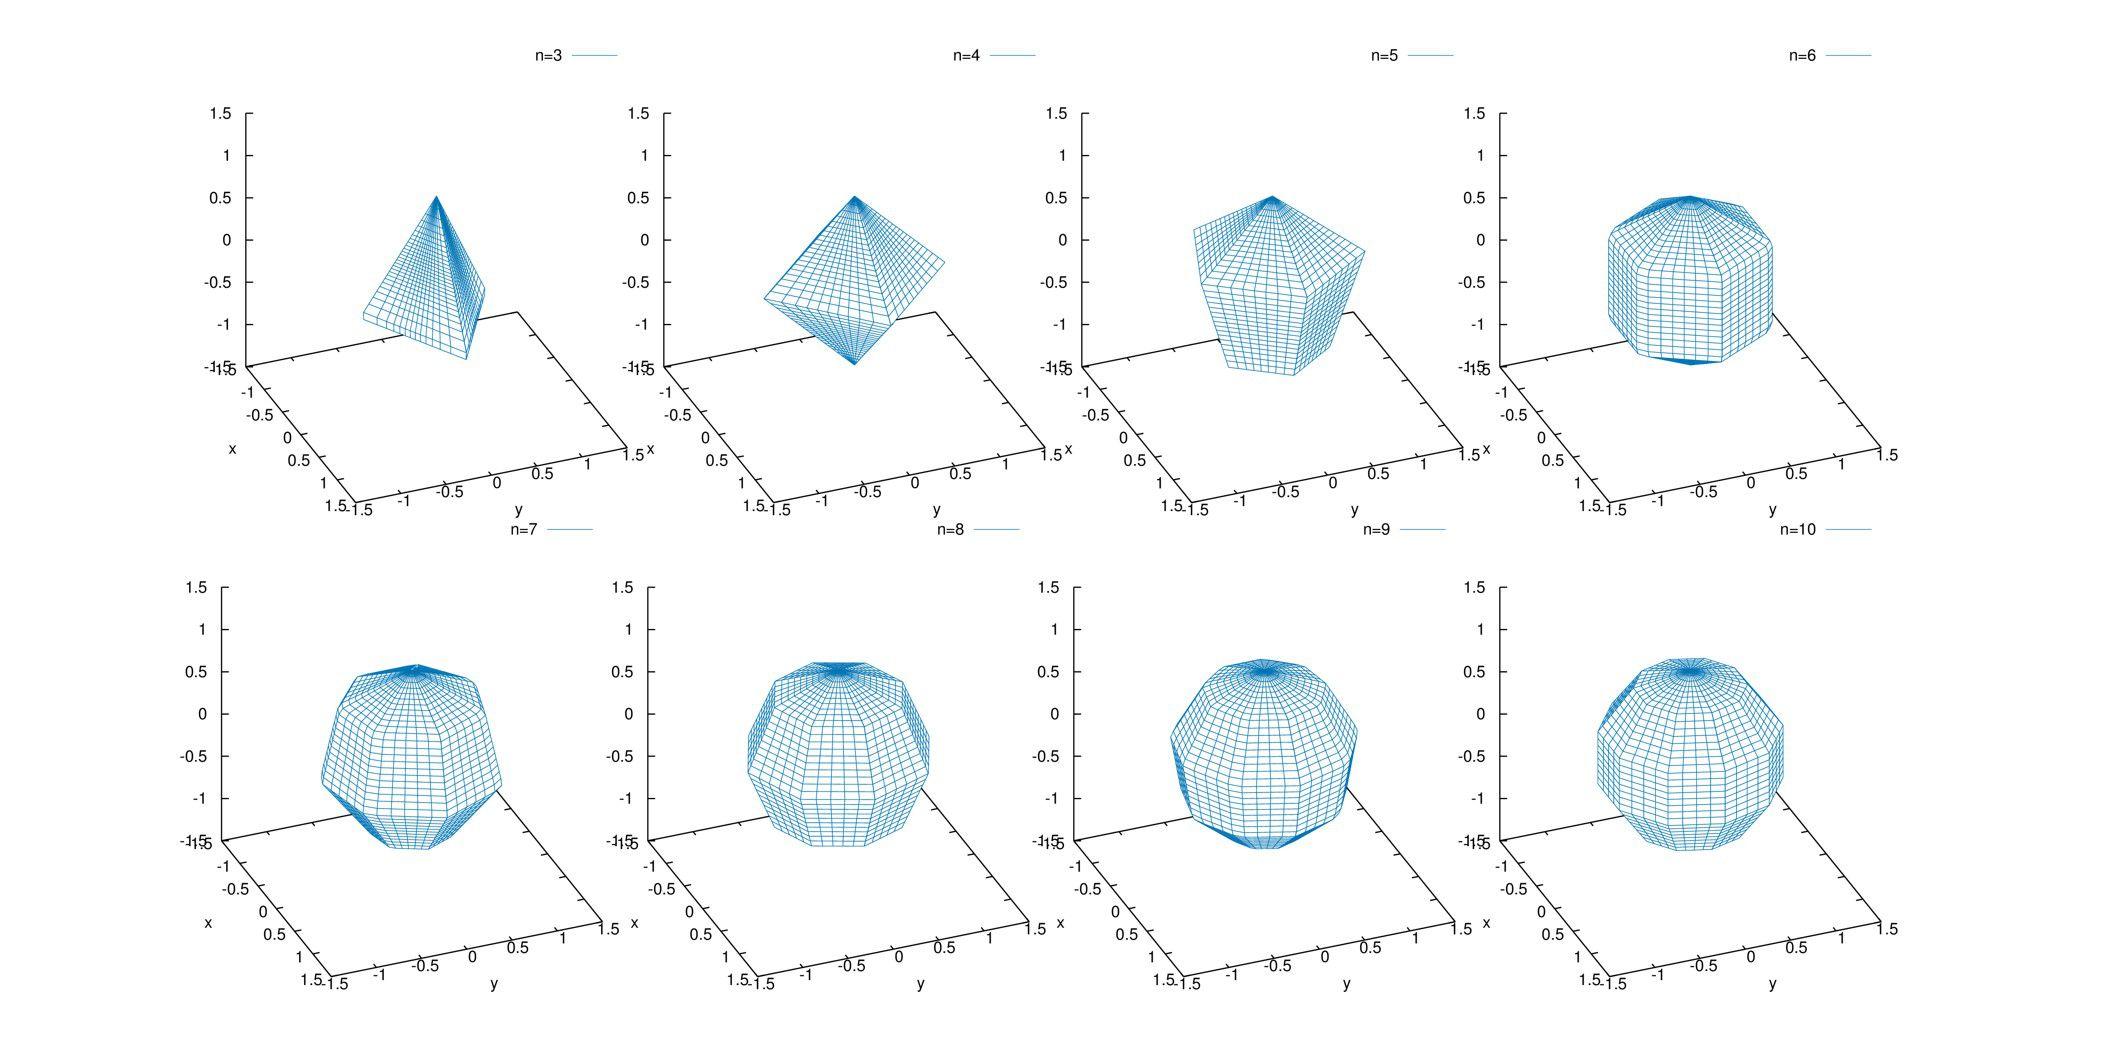 polygon3d_3_10_c